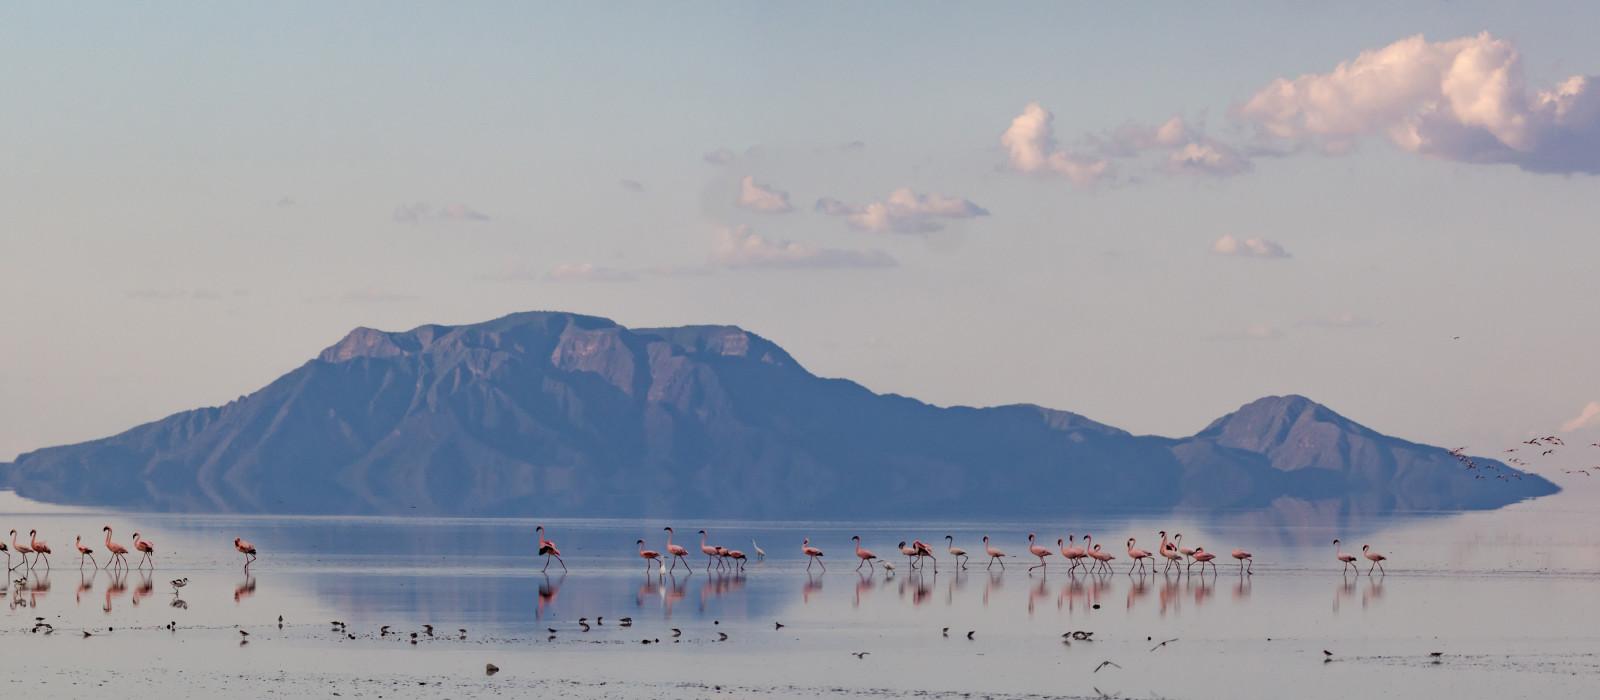 Flamingos at Lake Natron, Tanzania, Africa